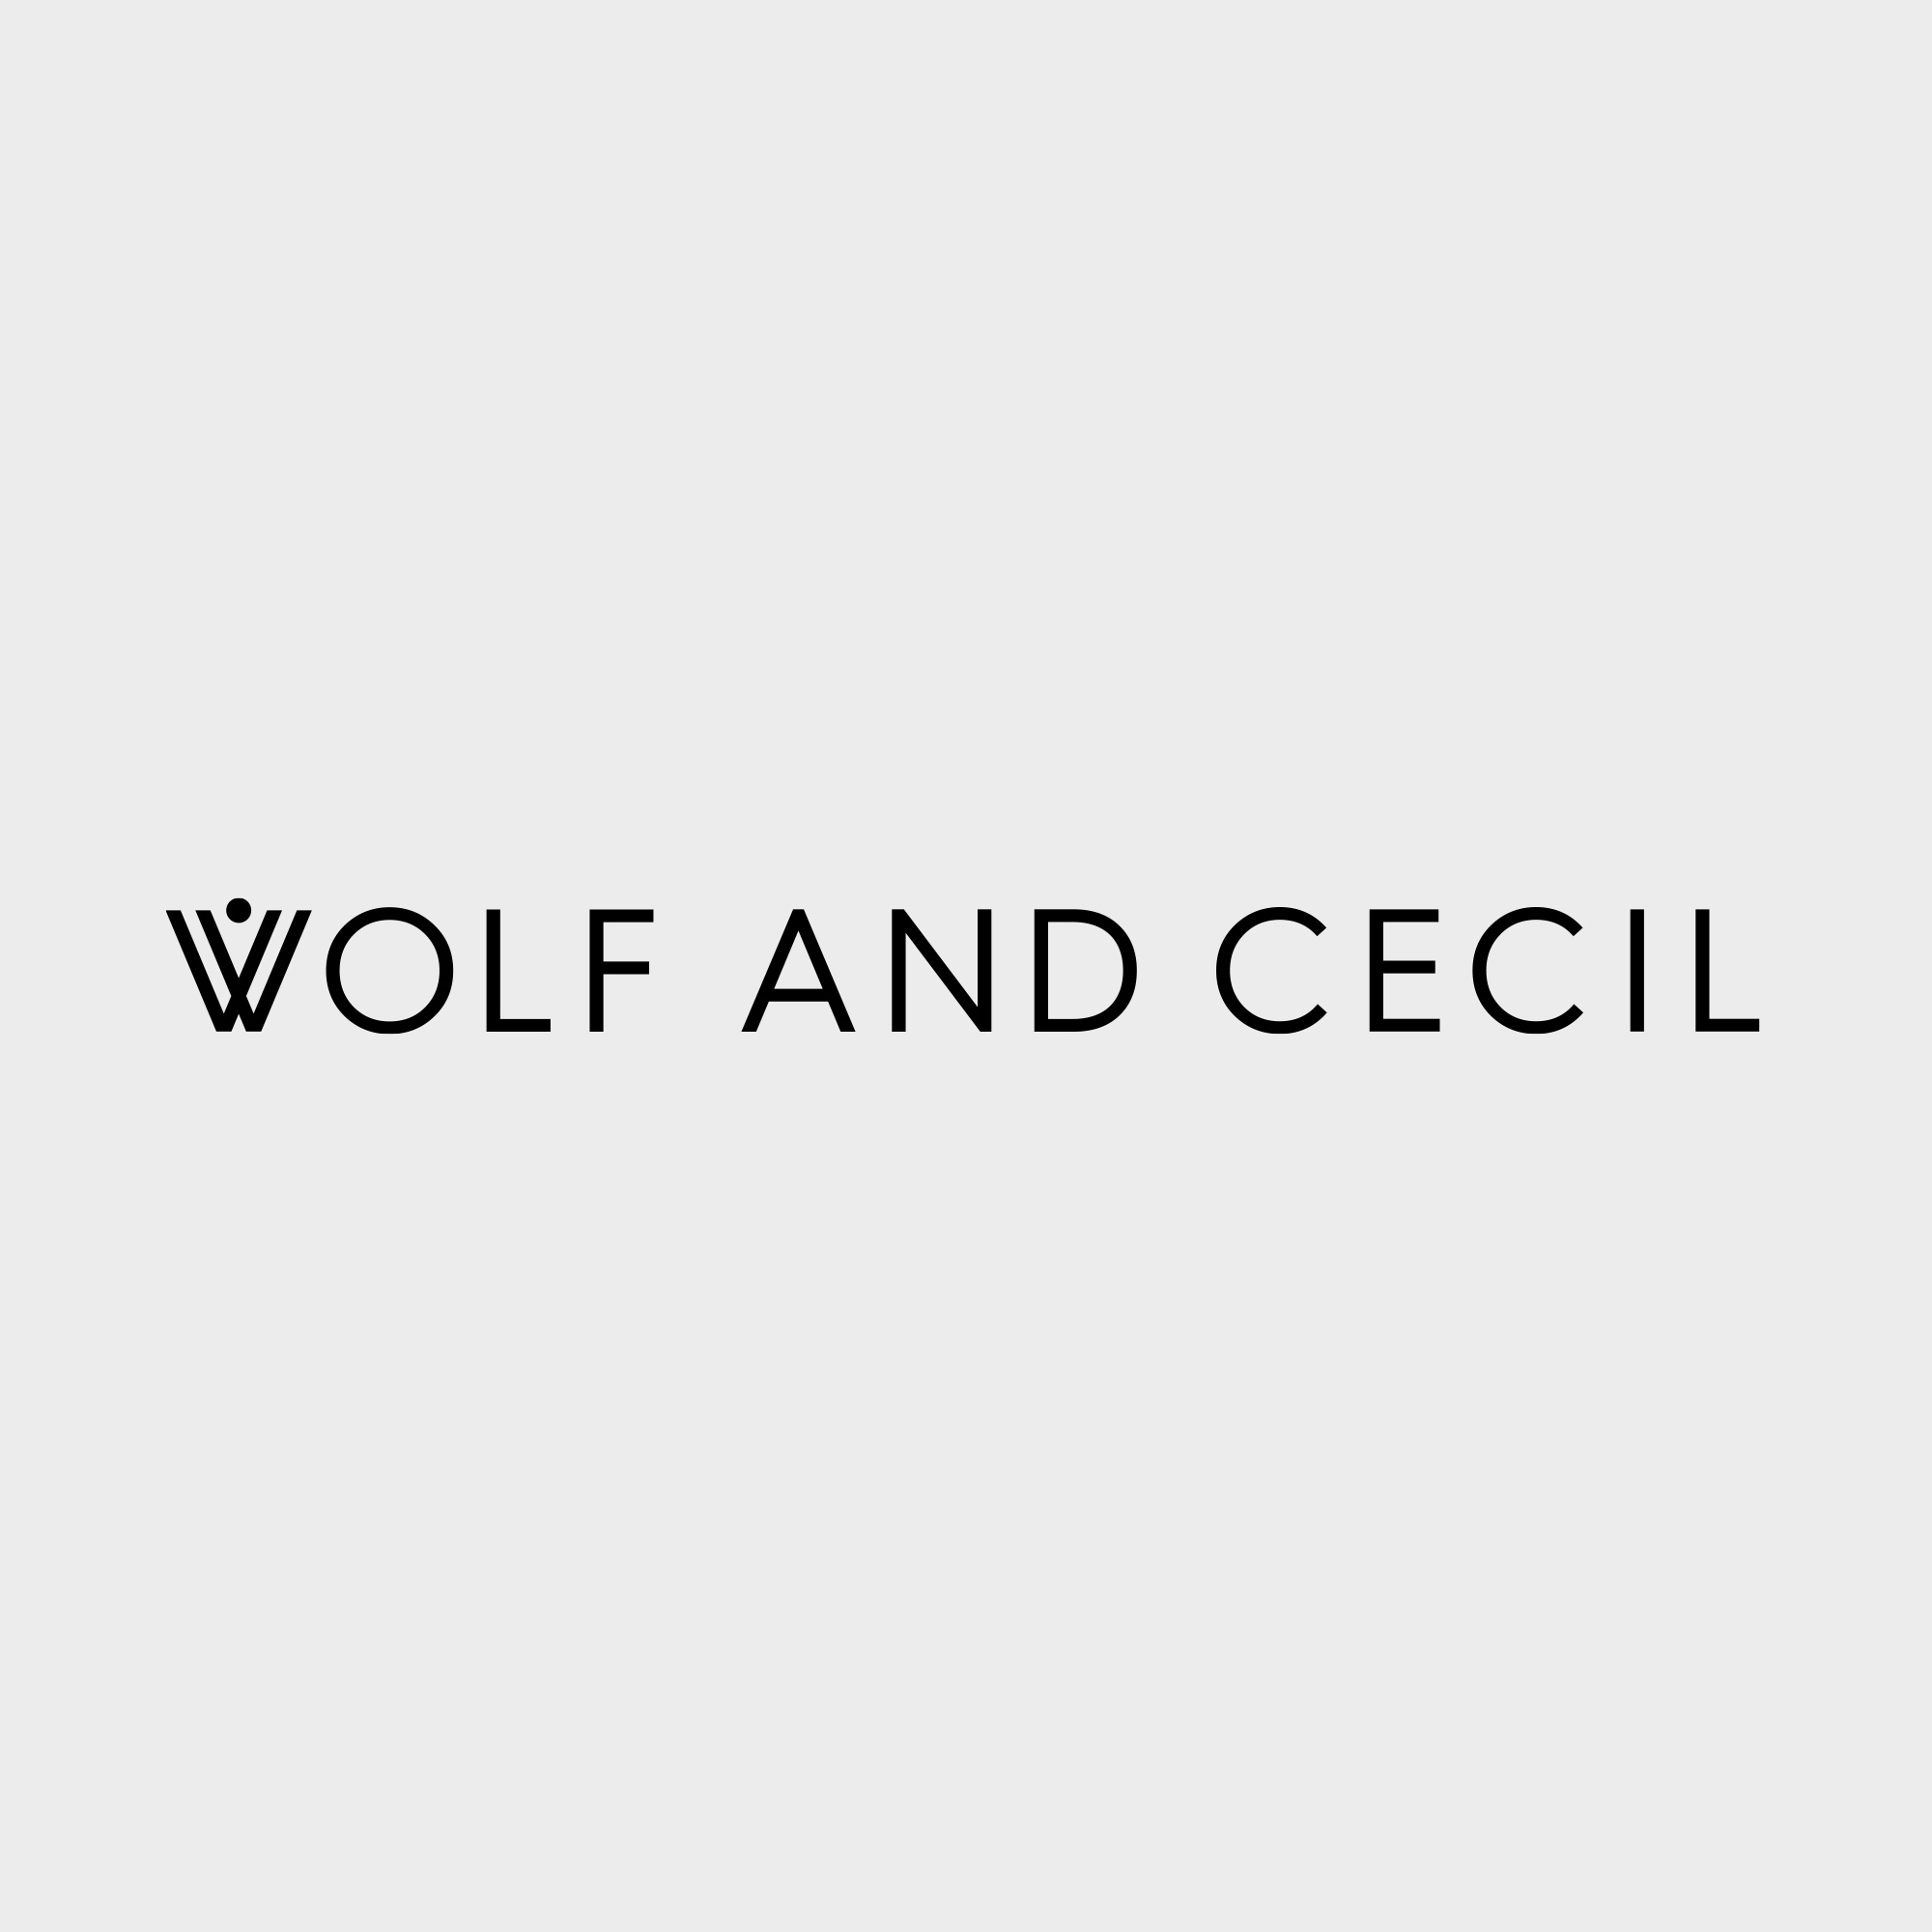 WPH_GALLERY_WOLF_1.jpg